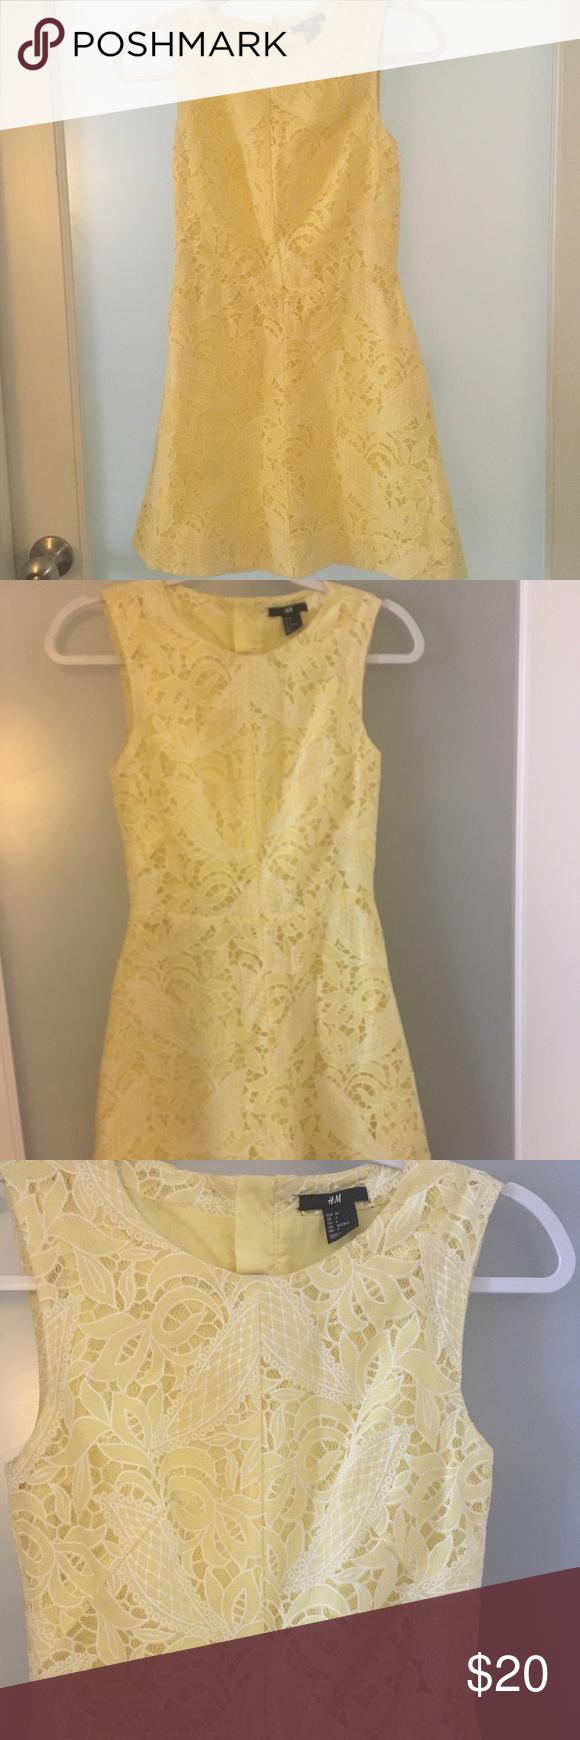 H M Mini Dress In Yellow And White Mini Dress Dresses Hm Dress [ 1740 x 580 Pixel ]